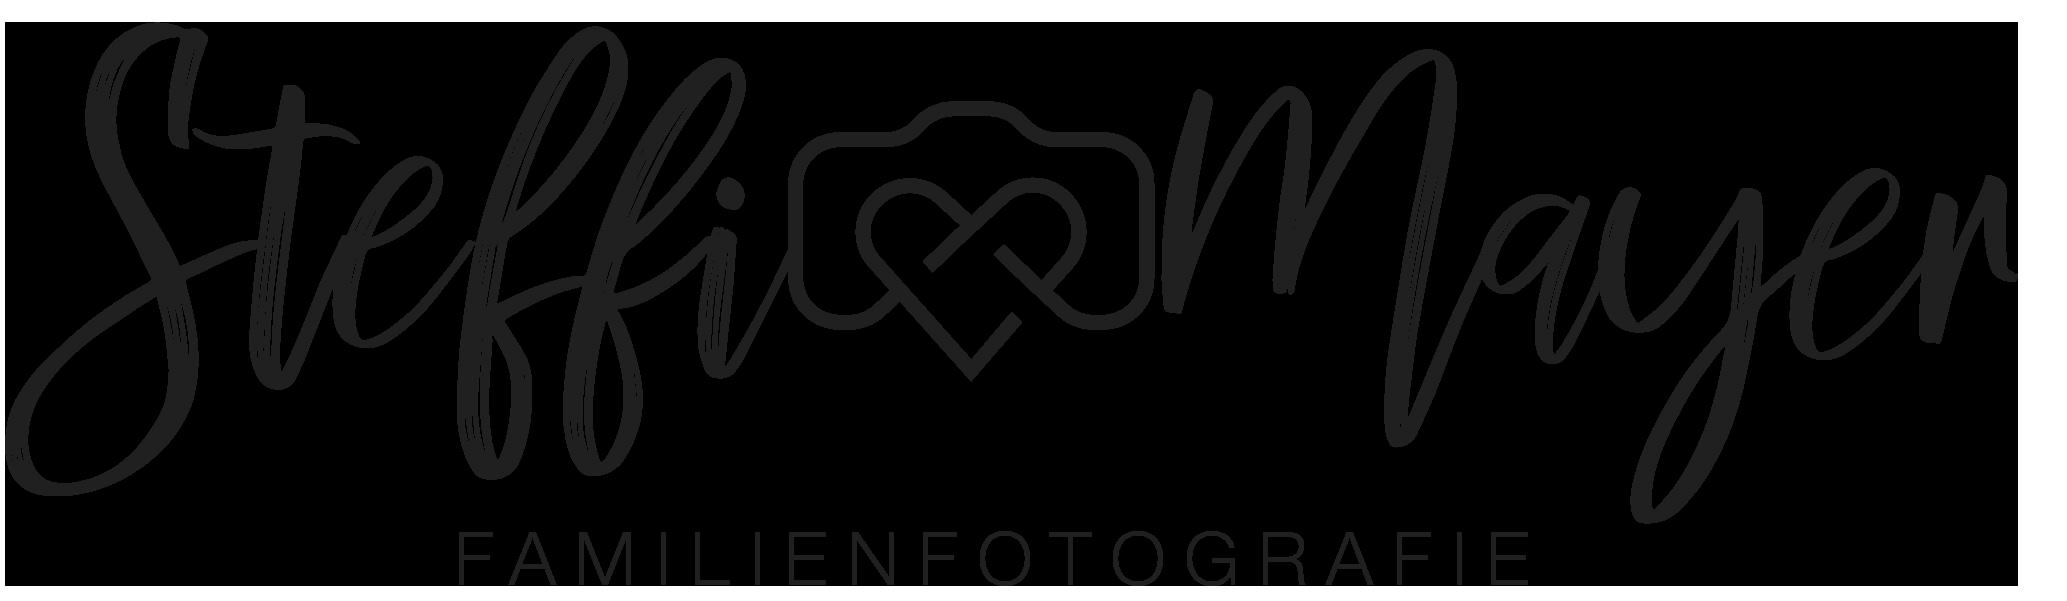 Steffi Mayer Familienfotografie